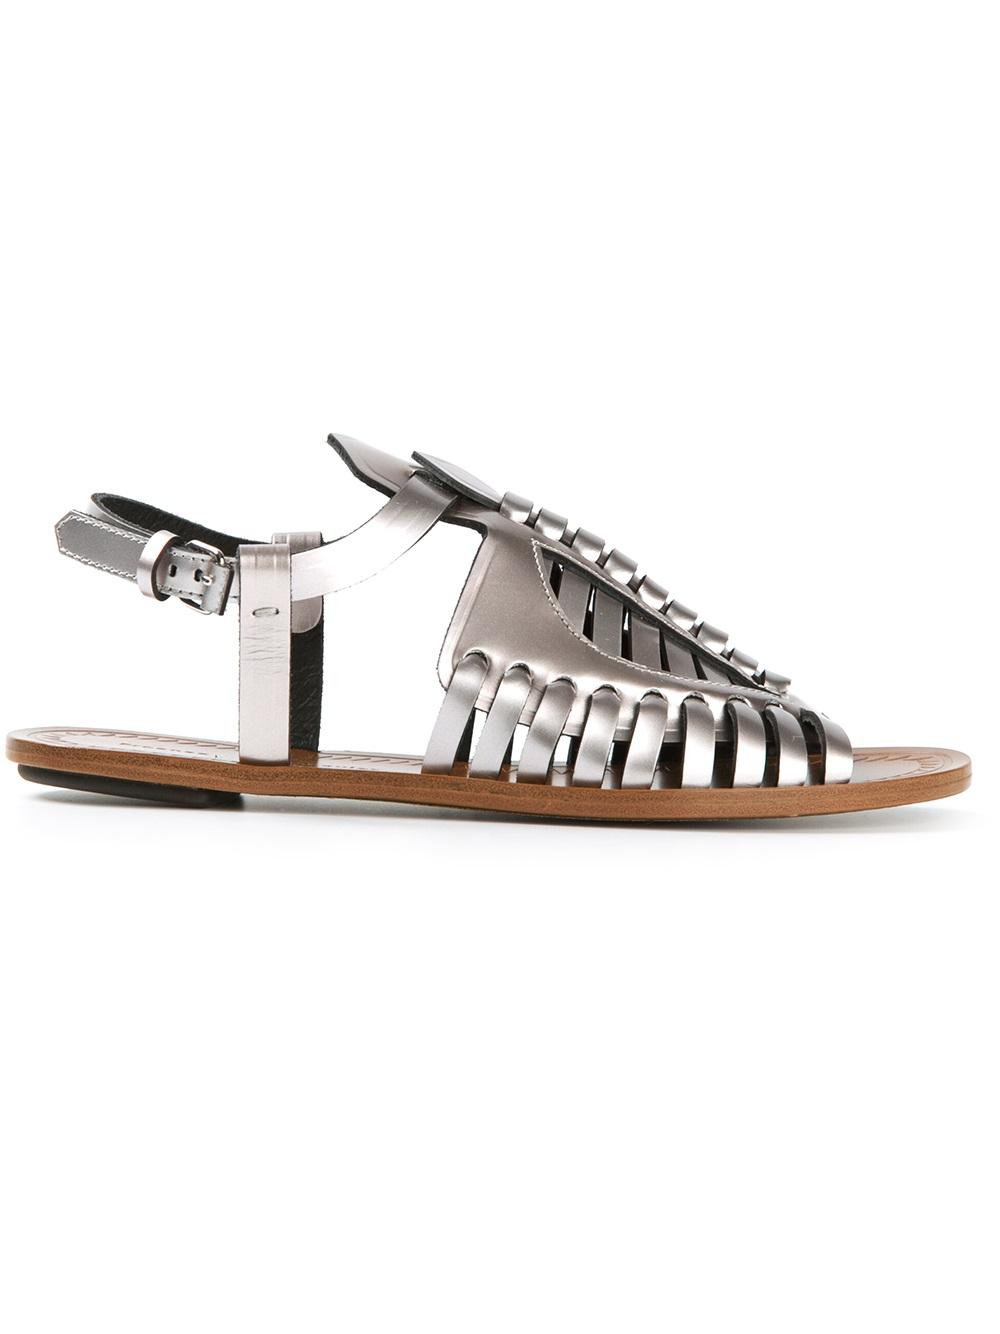 shop for cheap price new sale online Proenza Schouler Metallic Woven Sandals discount ebay cheap 2015 new kdSjS